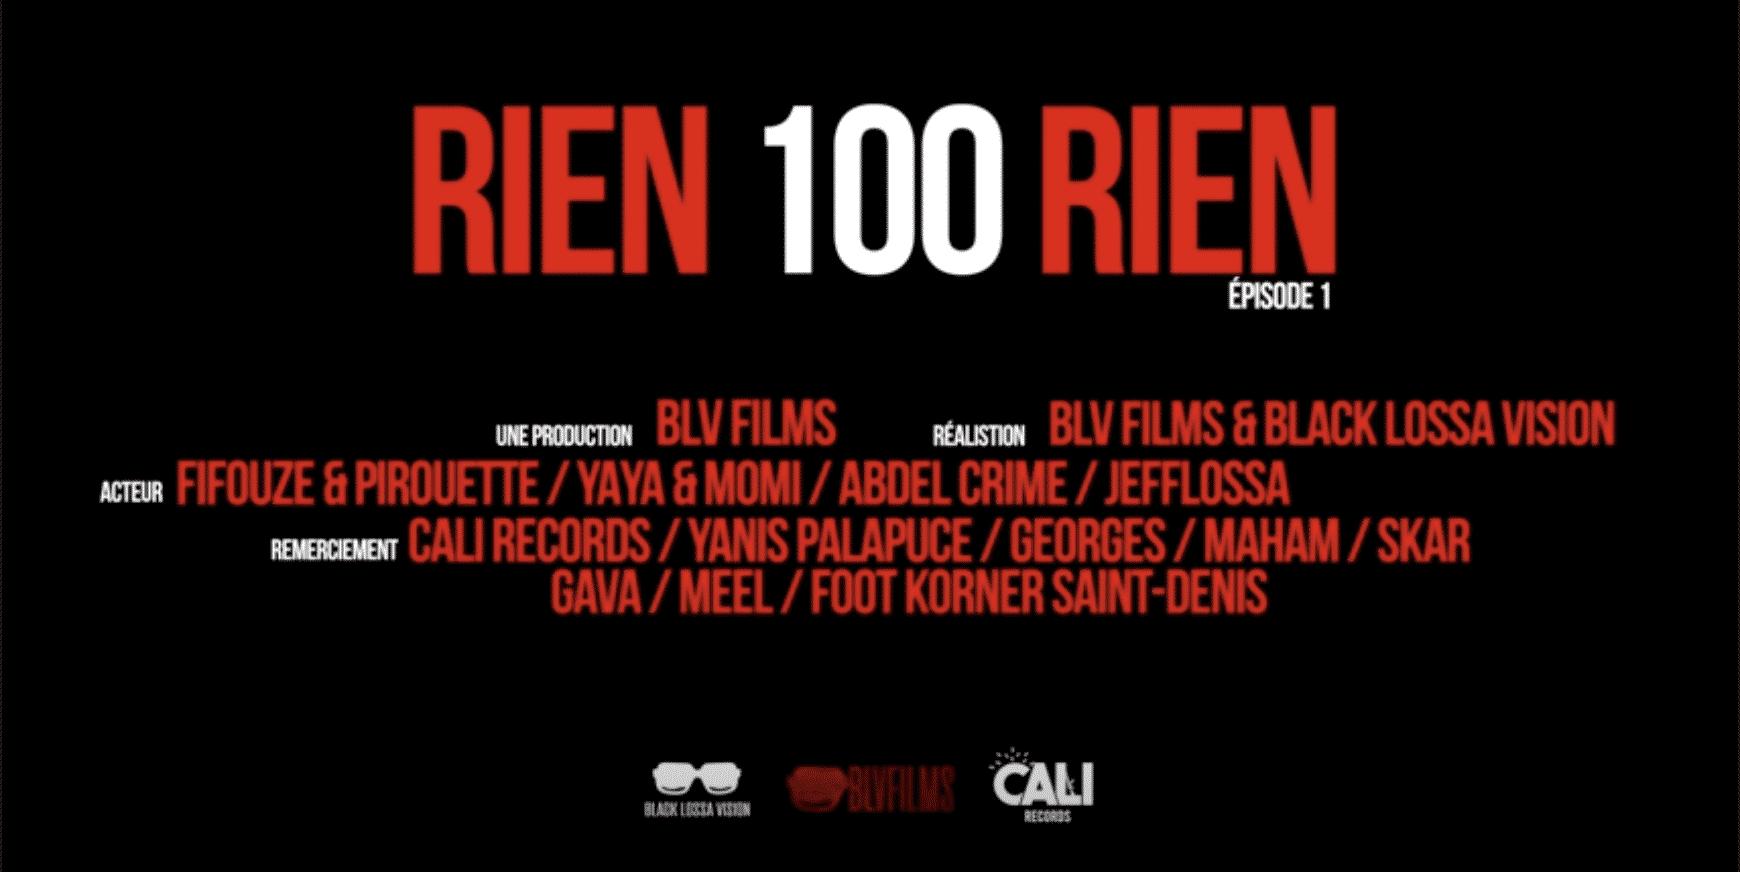 RIEN 100 RIEN - Episode 1 VF 73